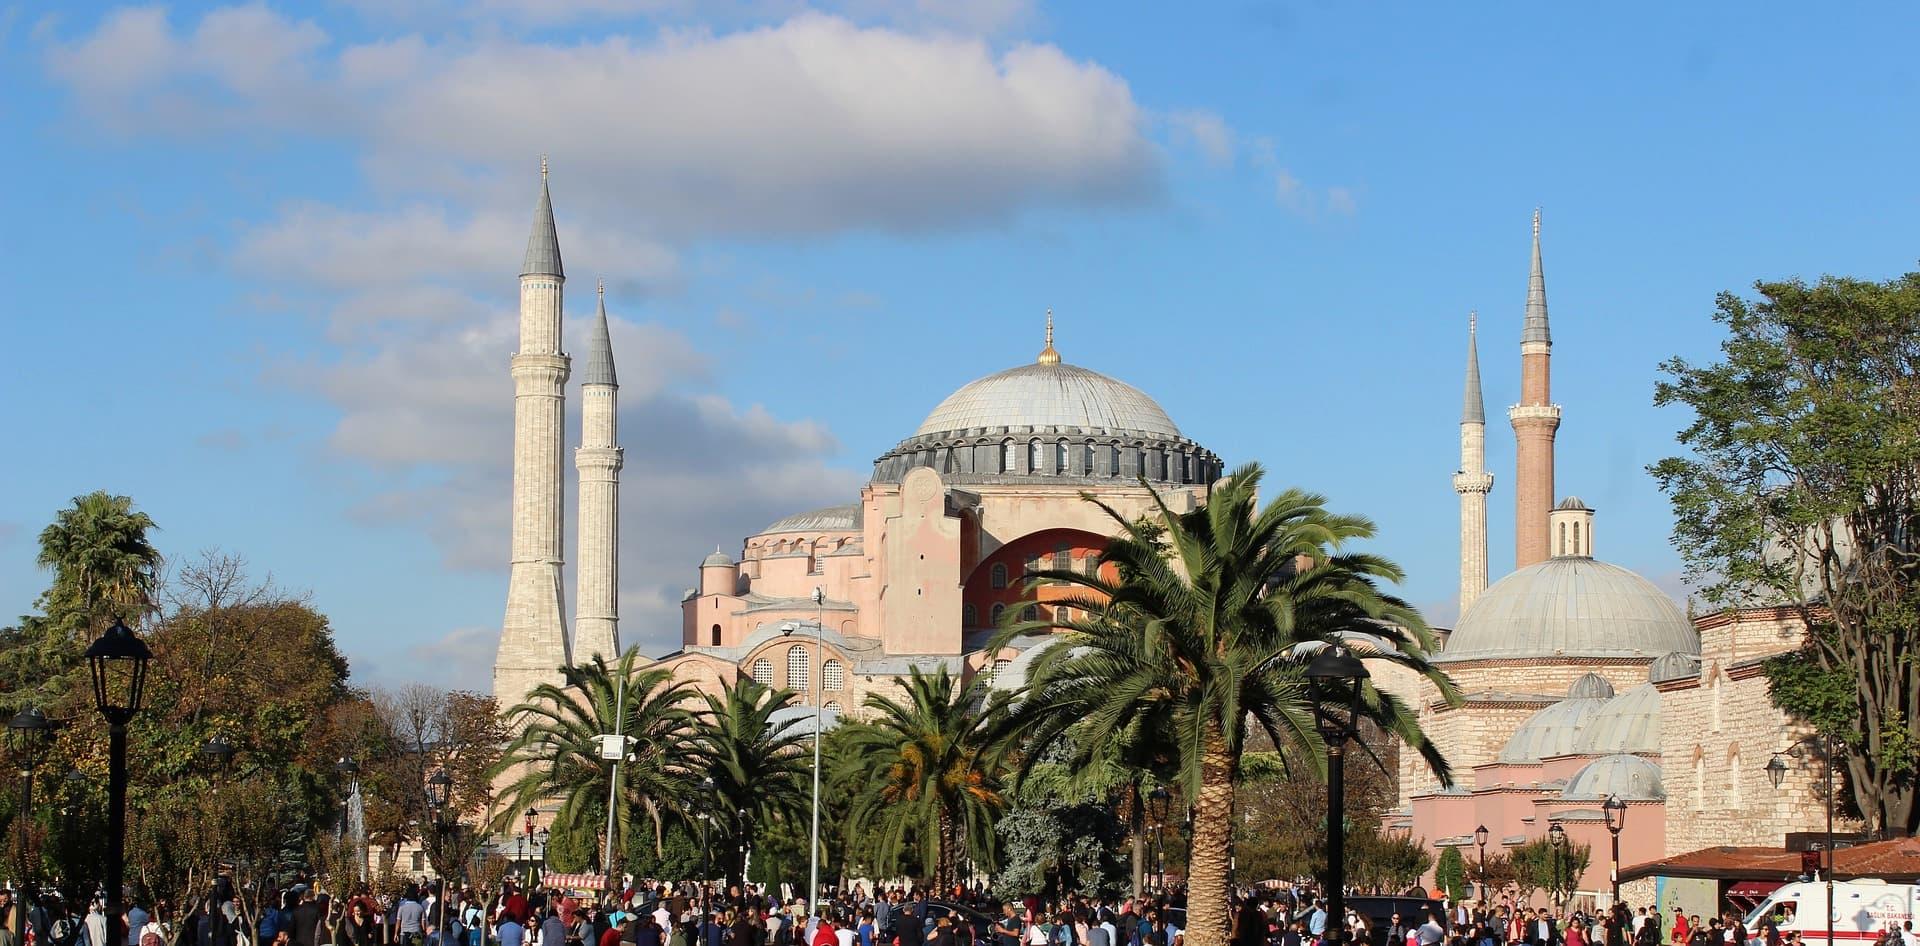 Moscheea Hagia Sofia